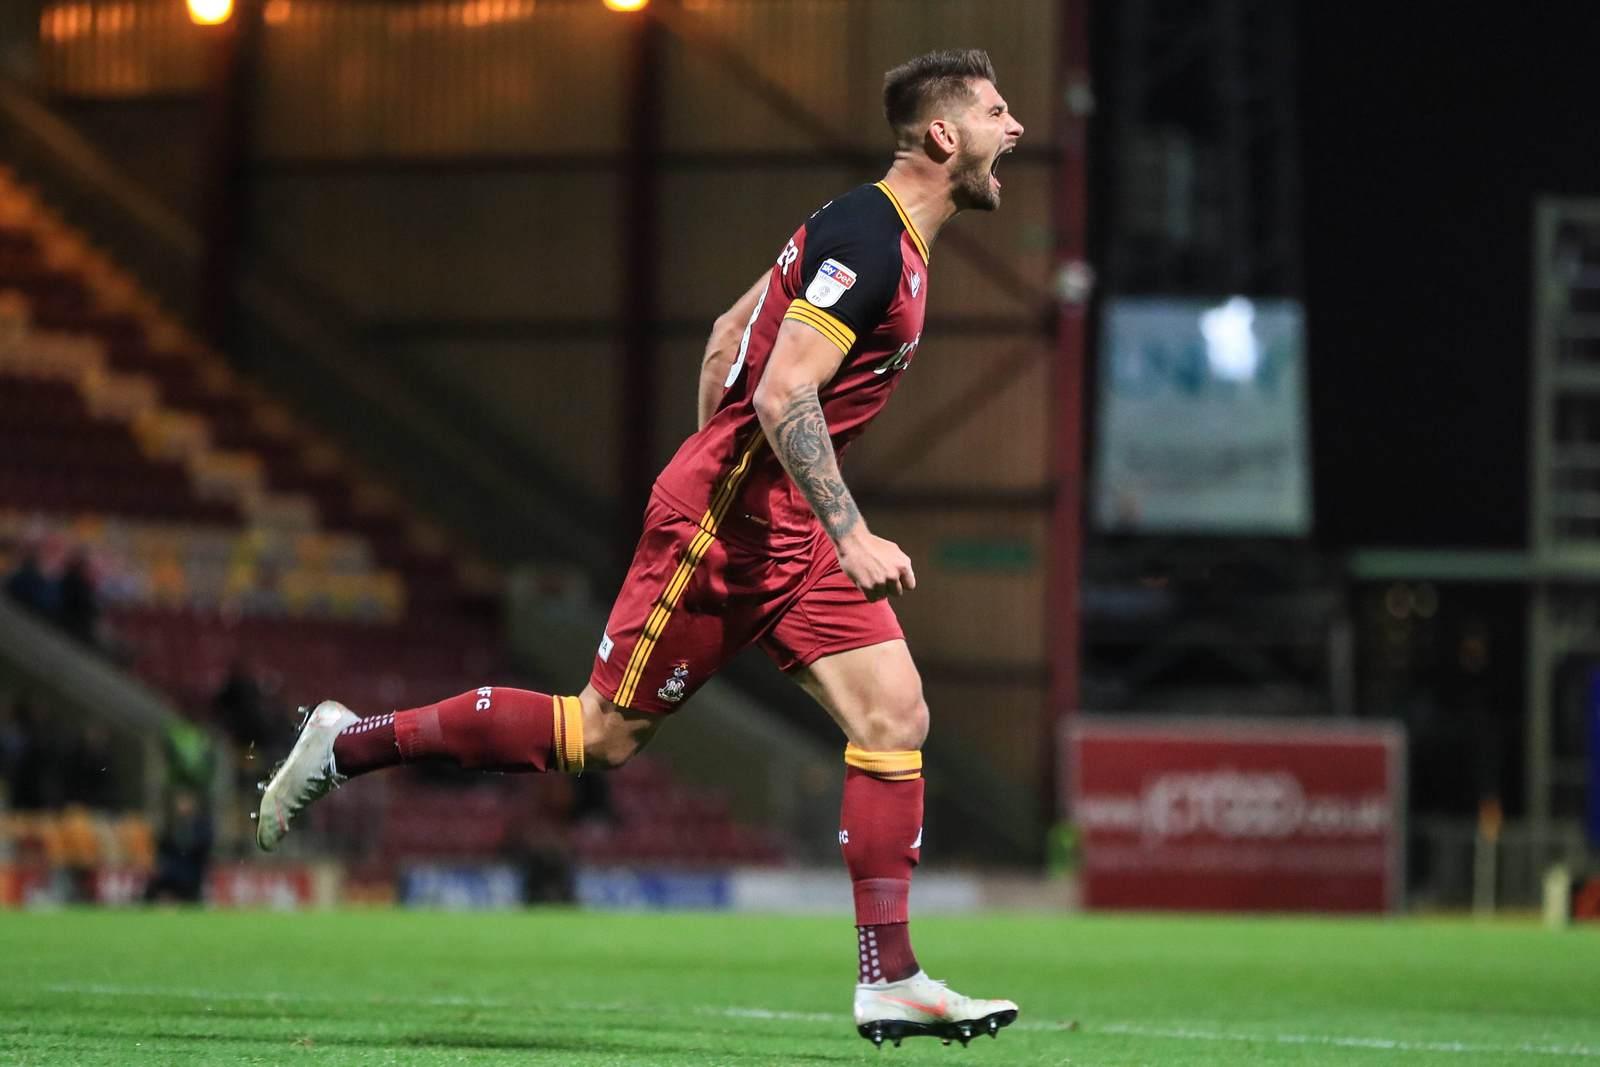 Kai Brünker jubelt für Bradford City